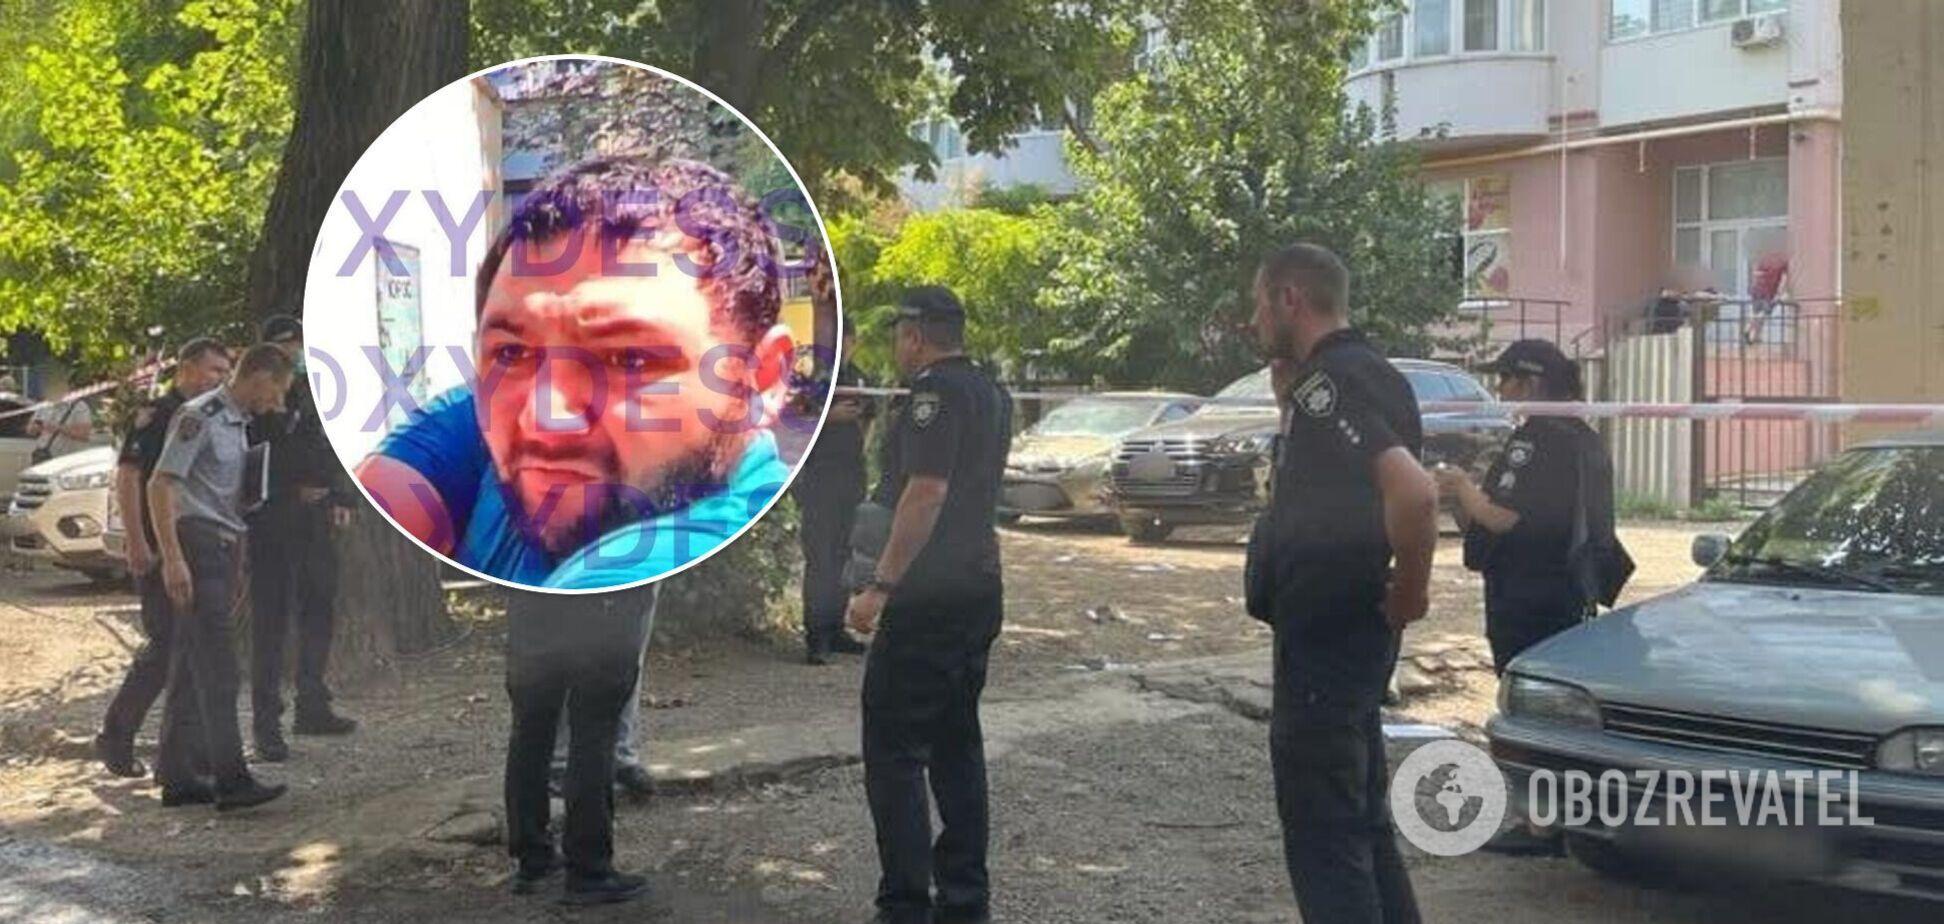 Момент убийства в Одессе попал на видео: фото киллера